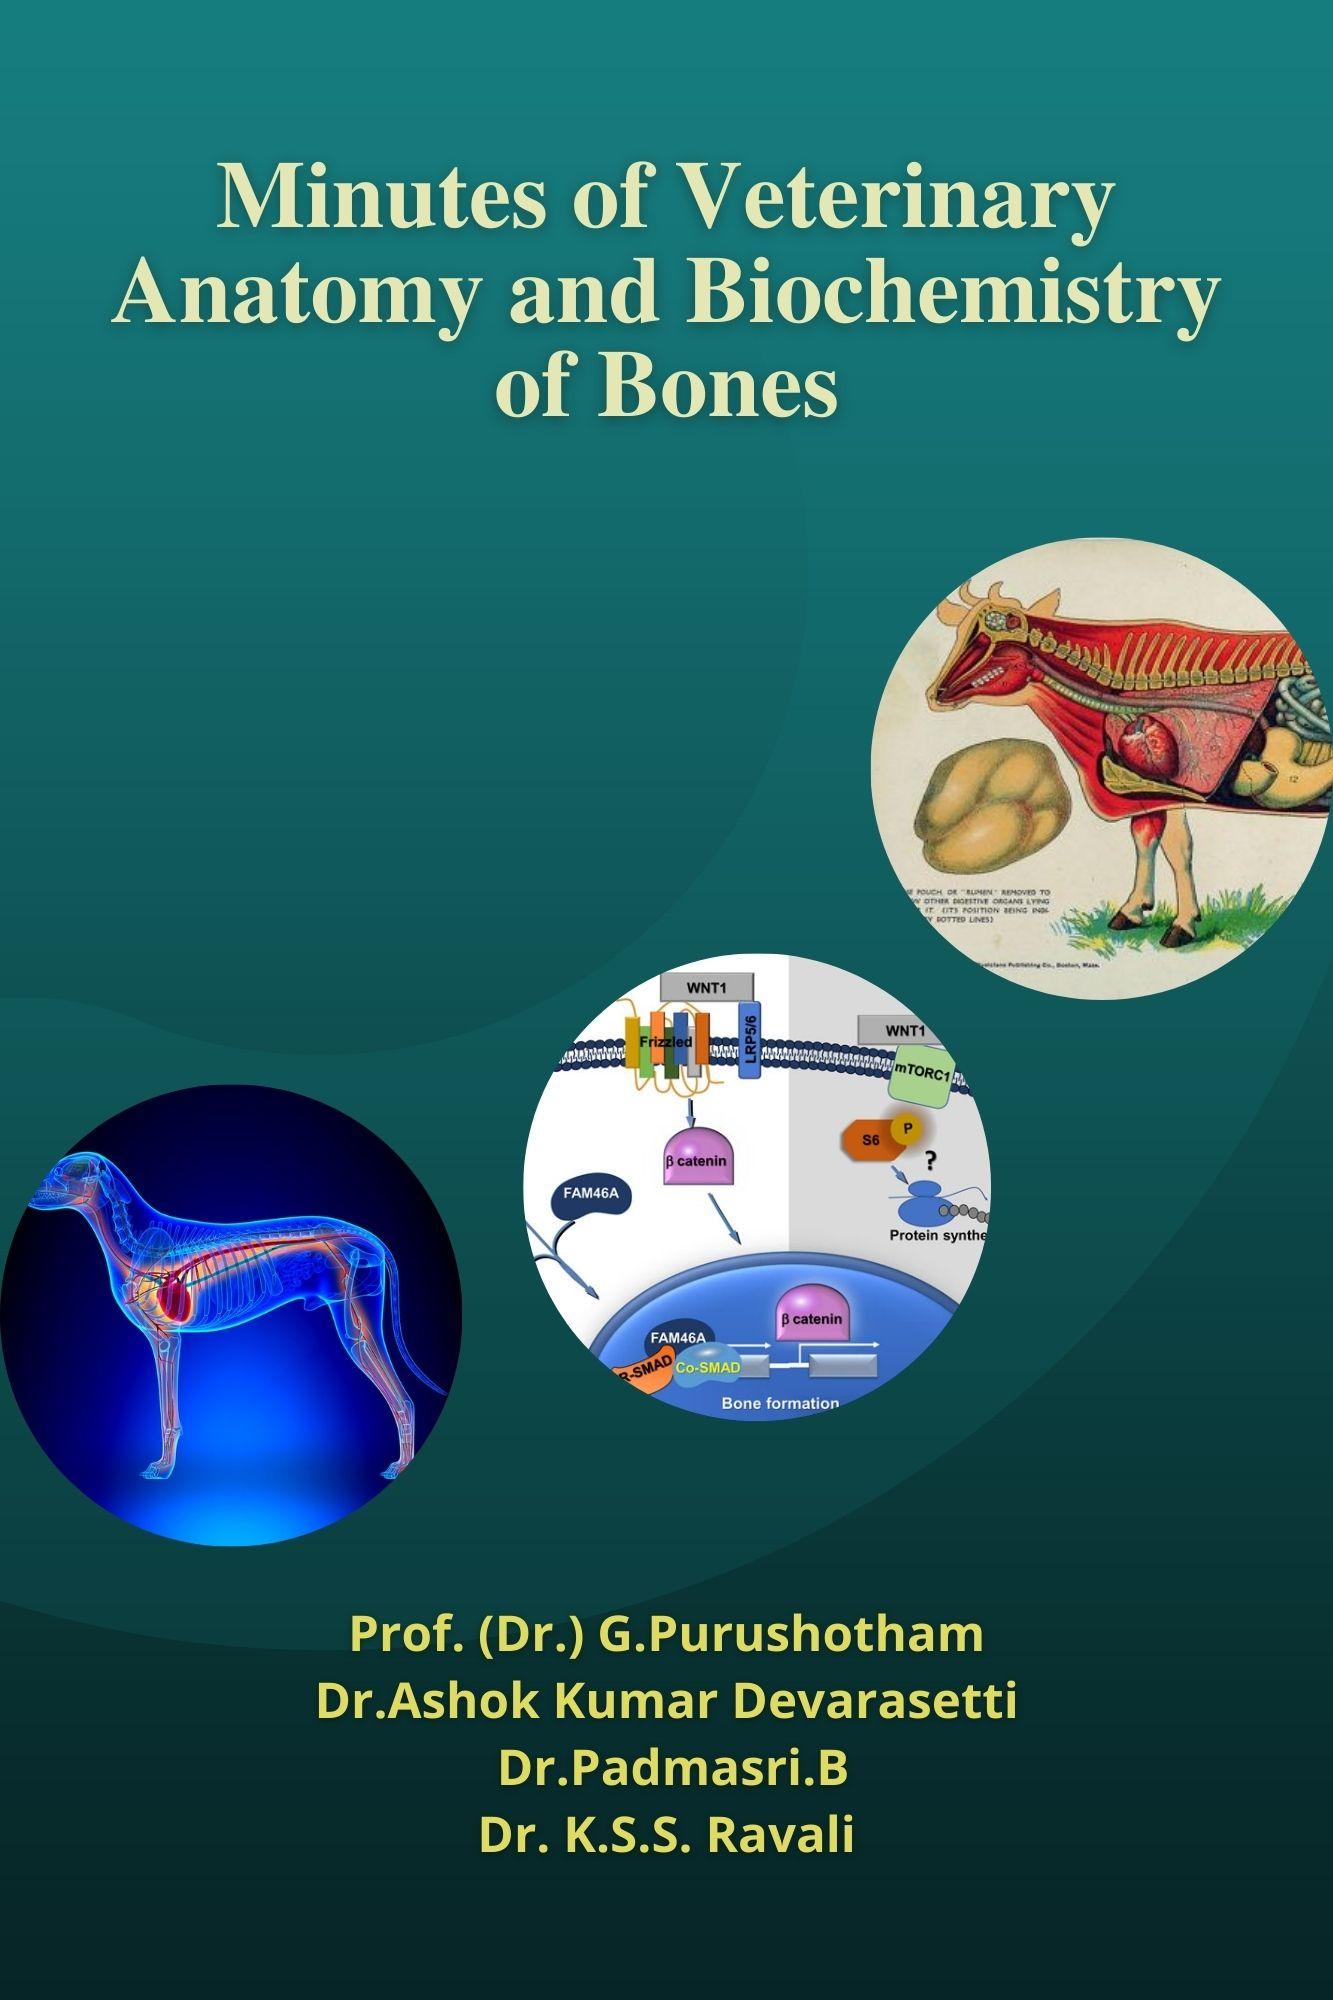 Minutes of Veterinary Anatomy and Biochemistry of Bones